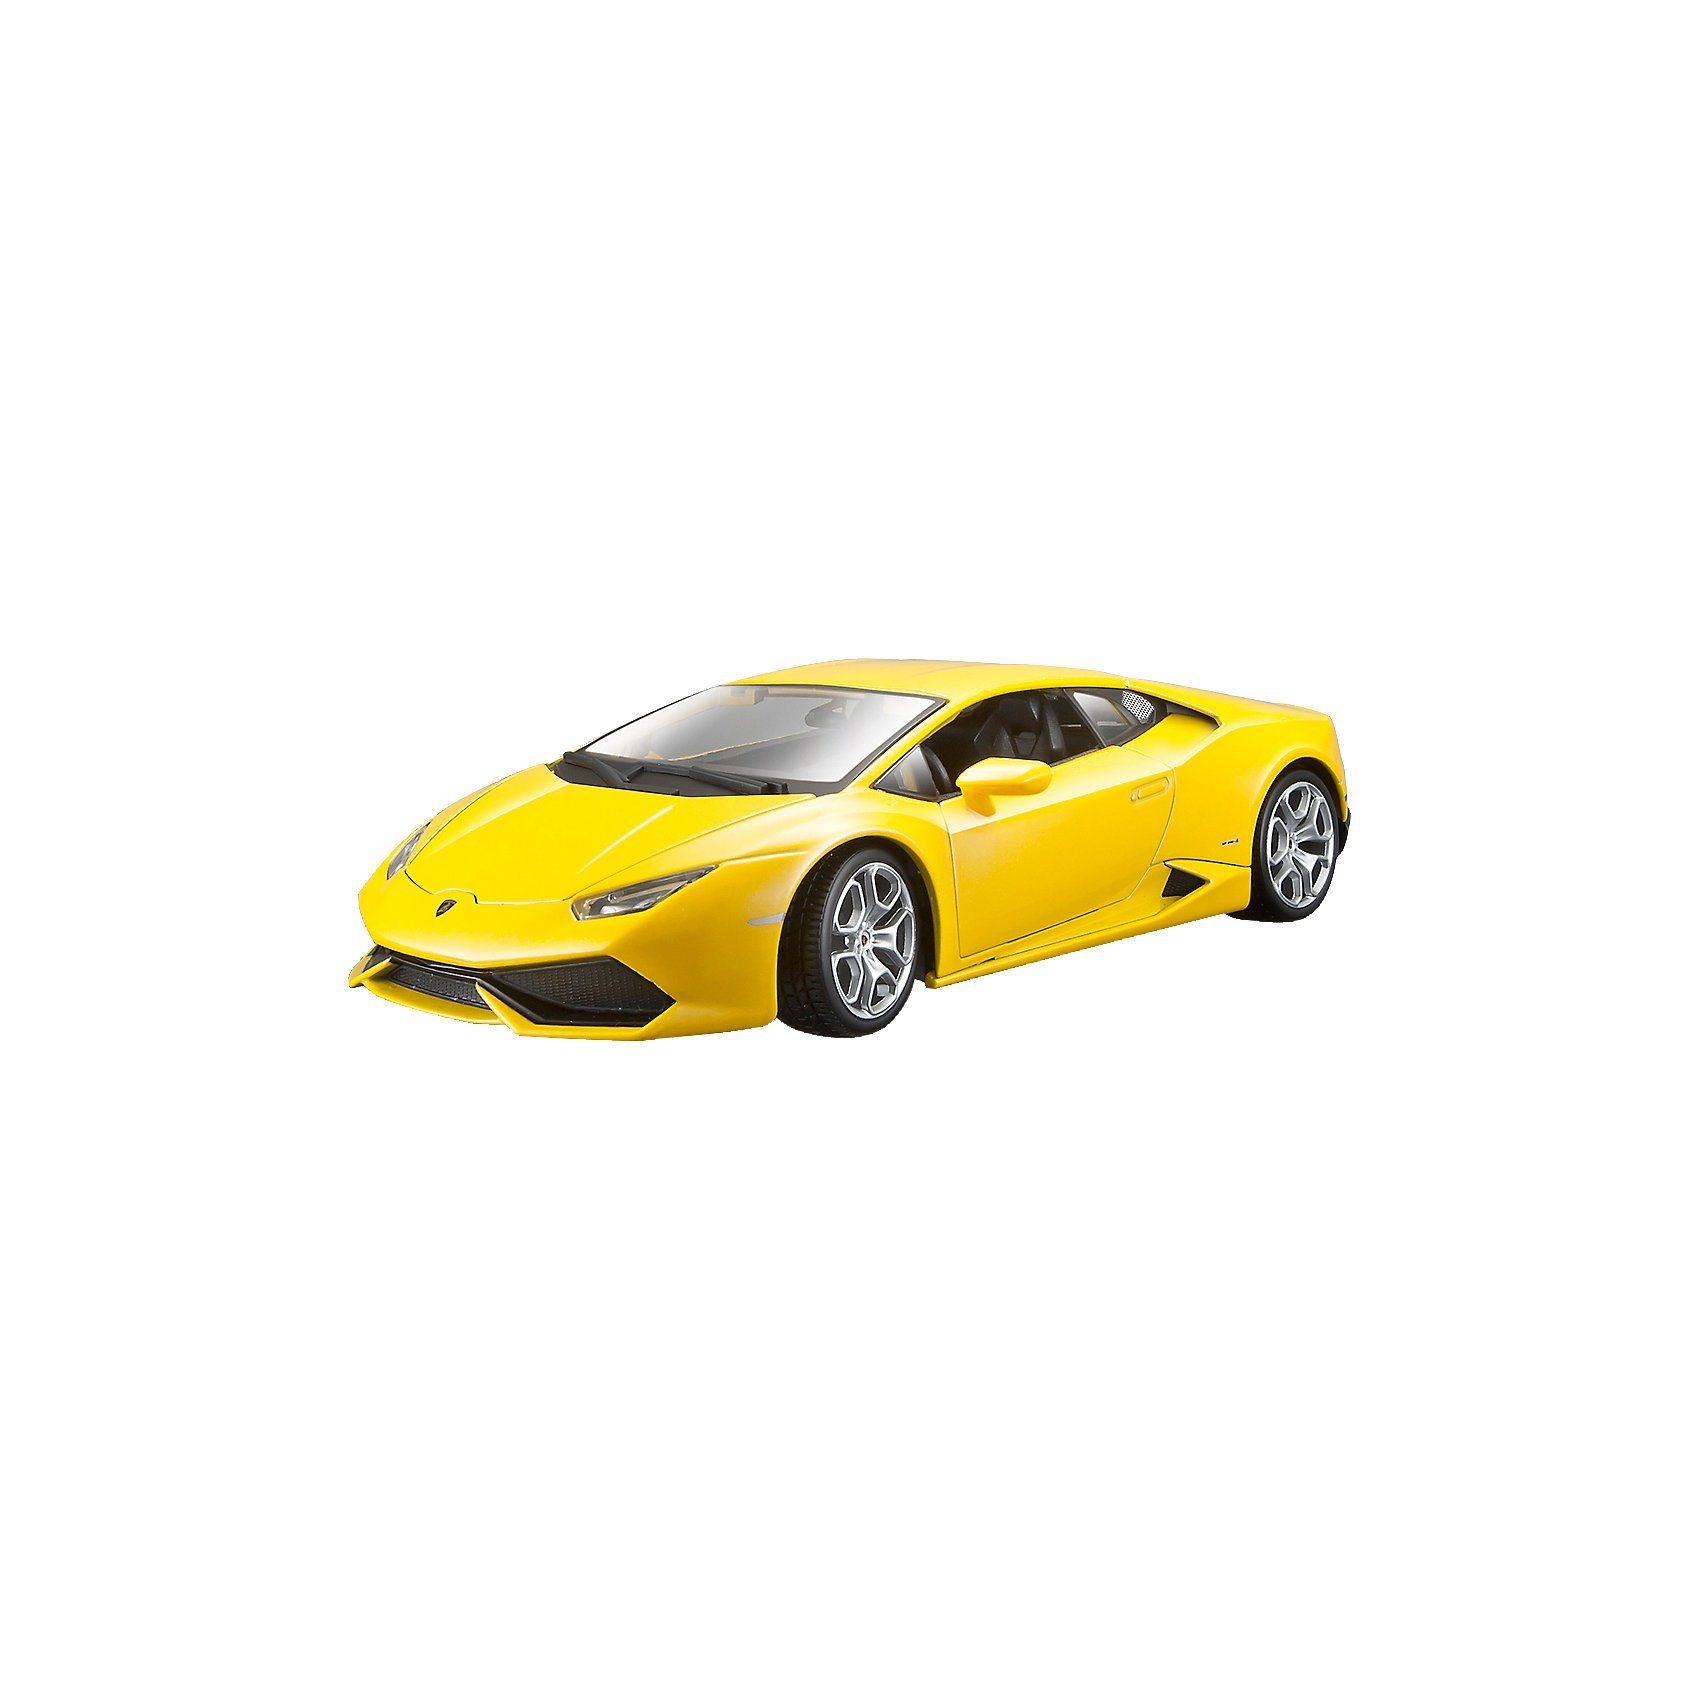 Bburago Lamborghini Huracán LP 610-4, gelb 1:18